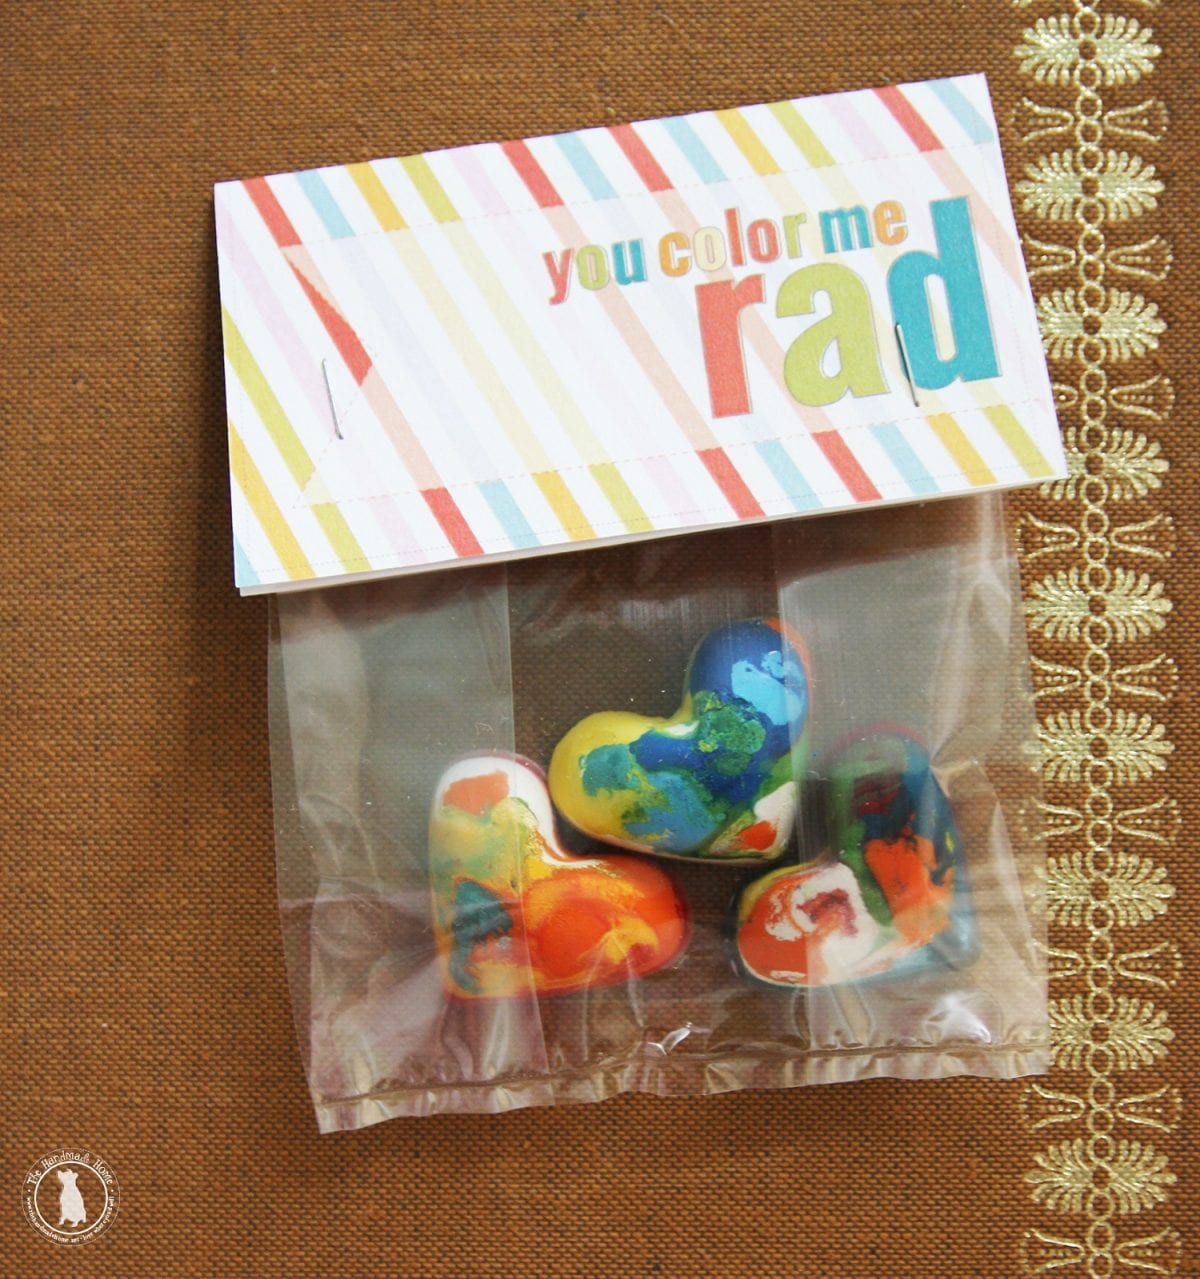 you_color_me_rad